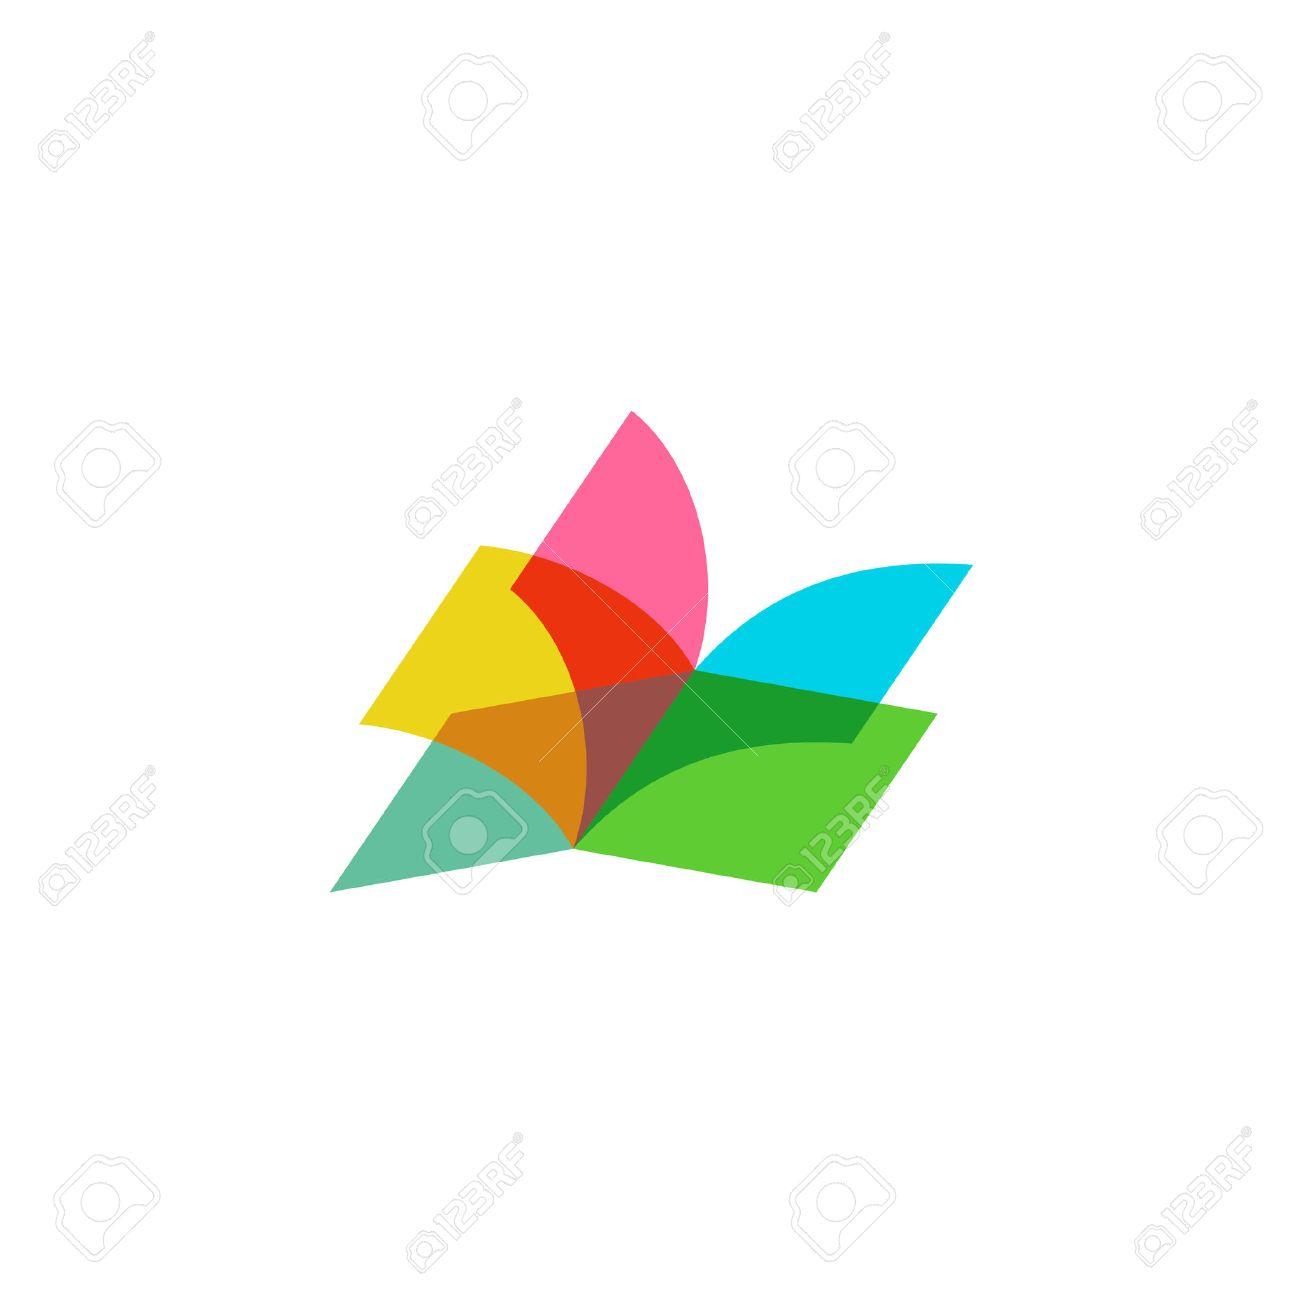 Color sheets transparent open book logo - 47969436